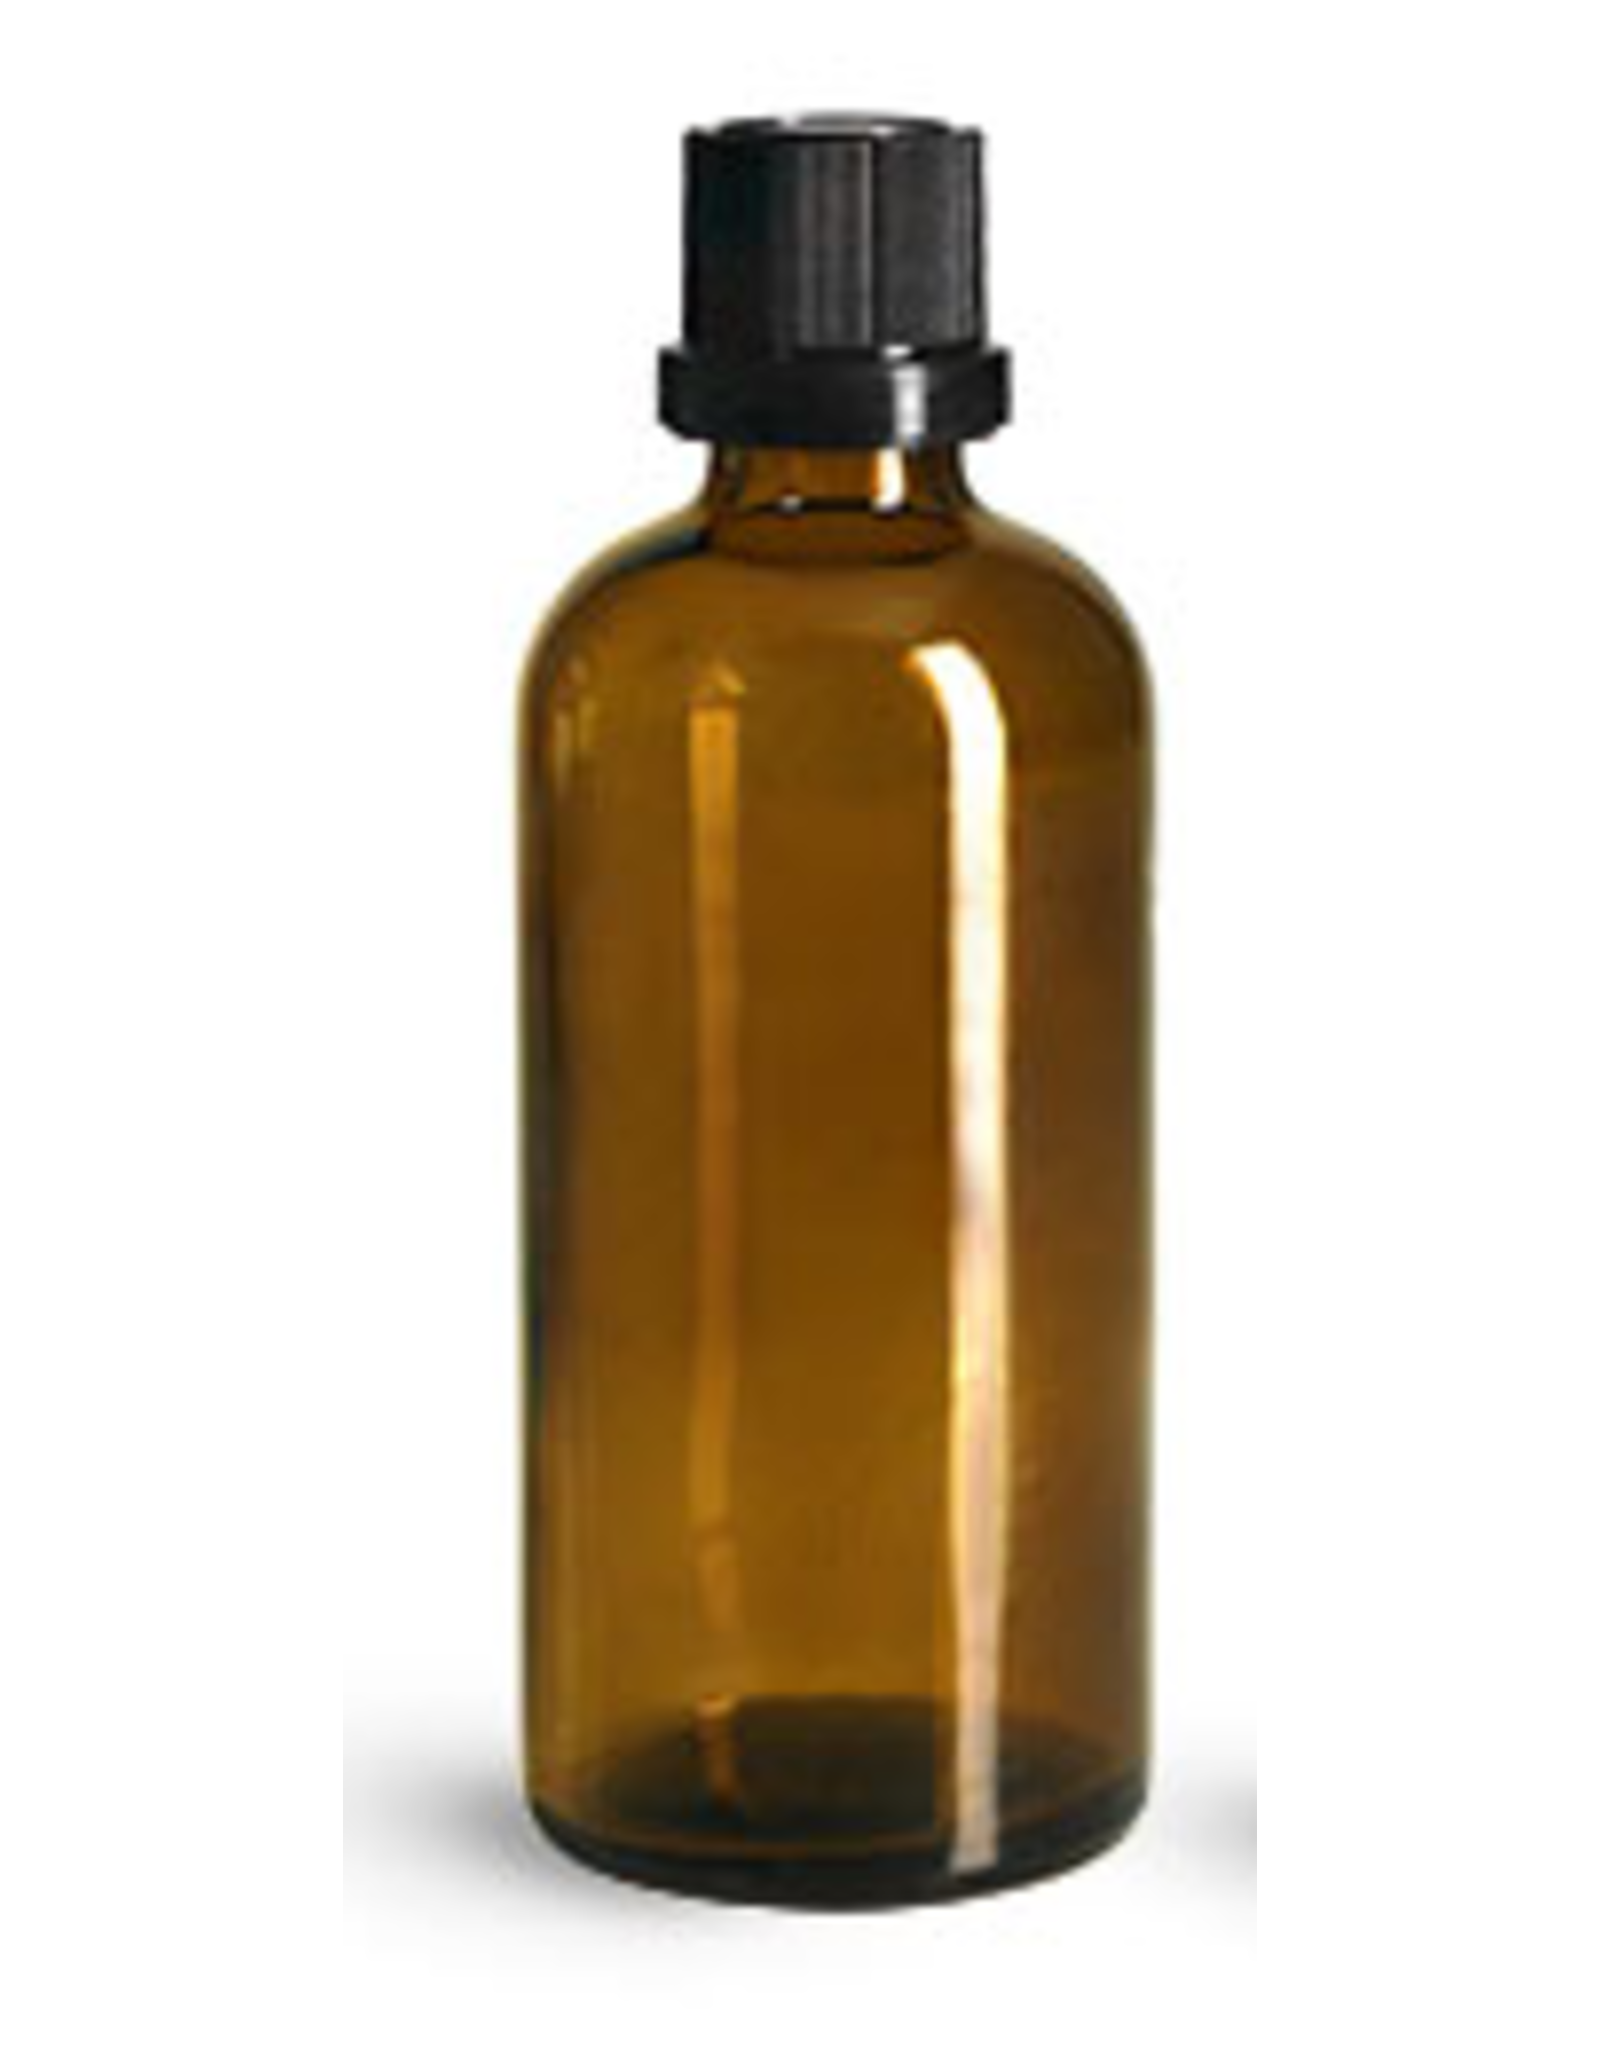 Garden City Essentials 100ml amber dropper bottle